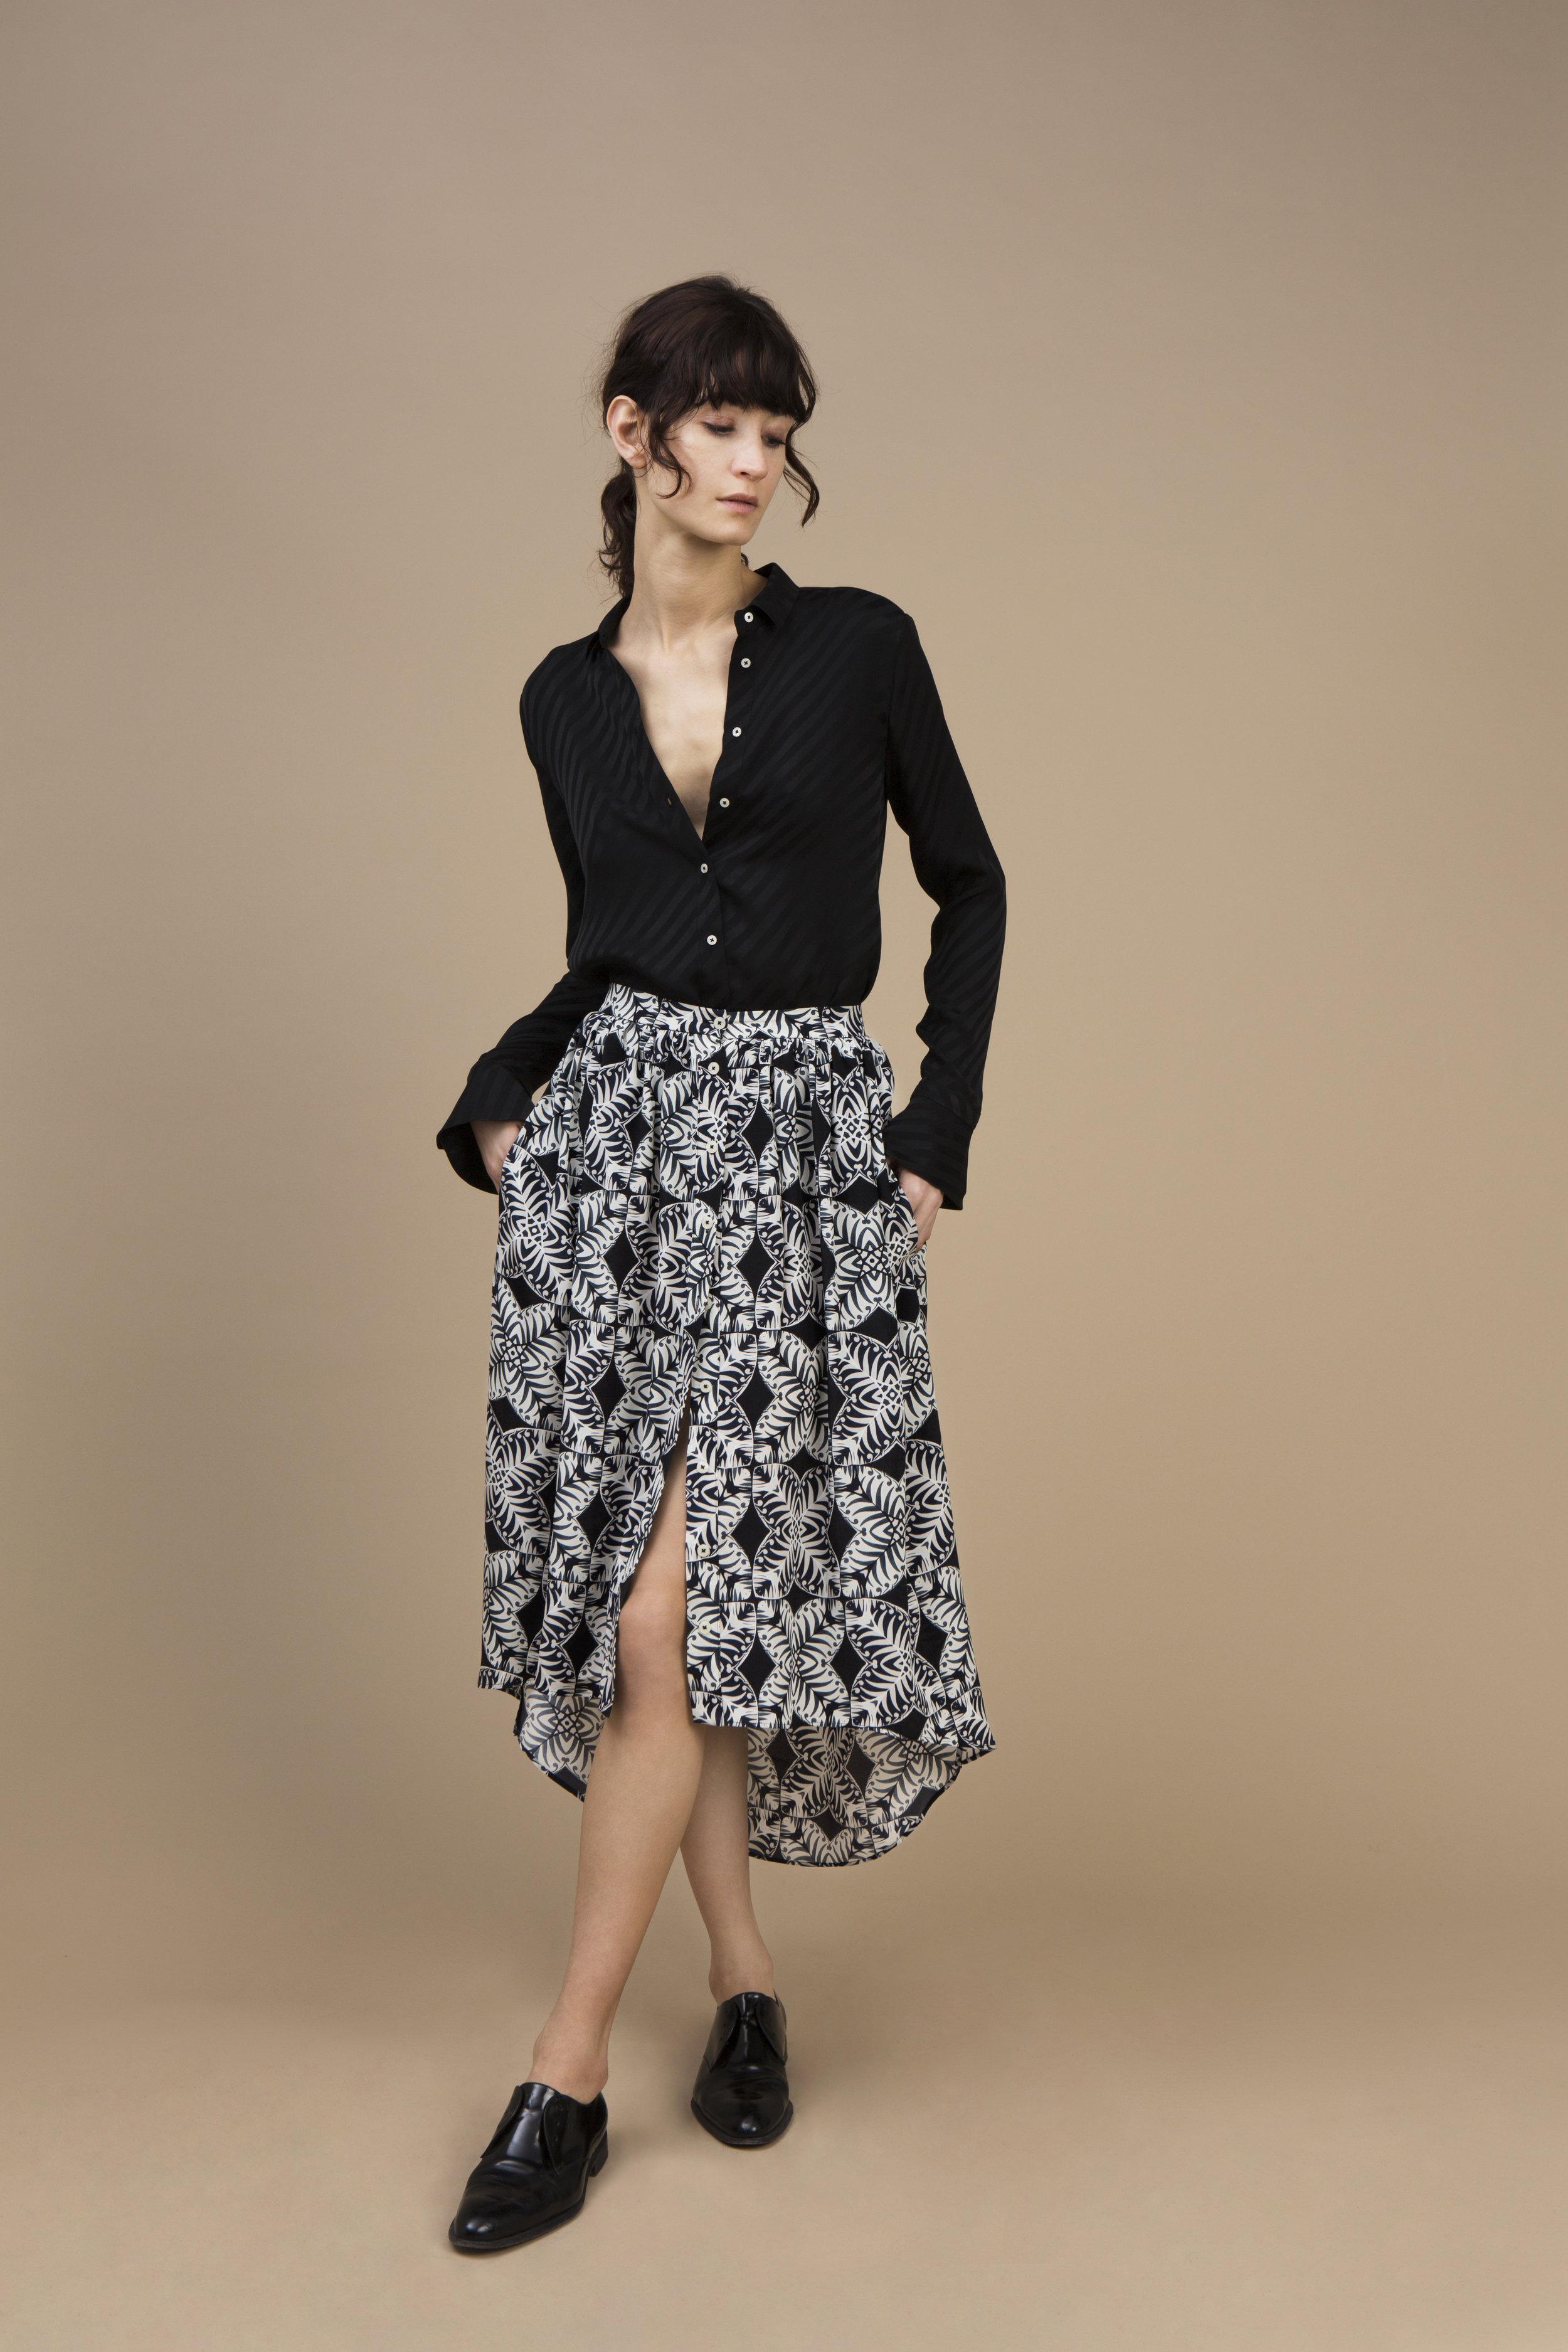 Crepe satin silk Small collar shirt — Stripy Black and Long and asymmetric skirt in crepe silk — Kaleidoscope